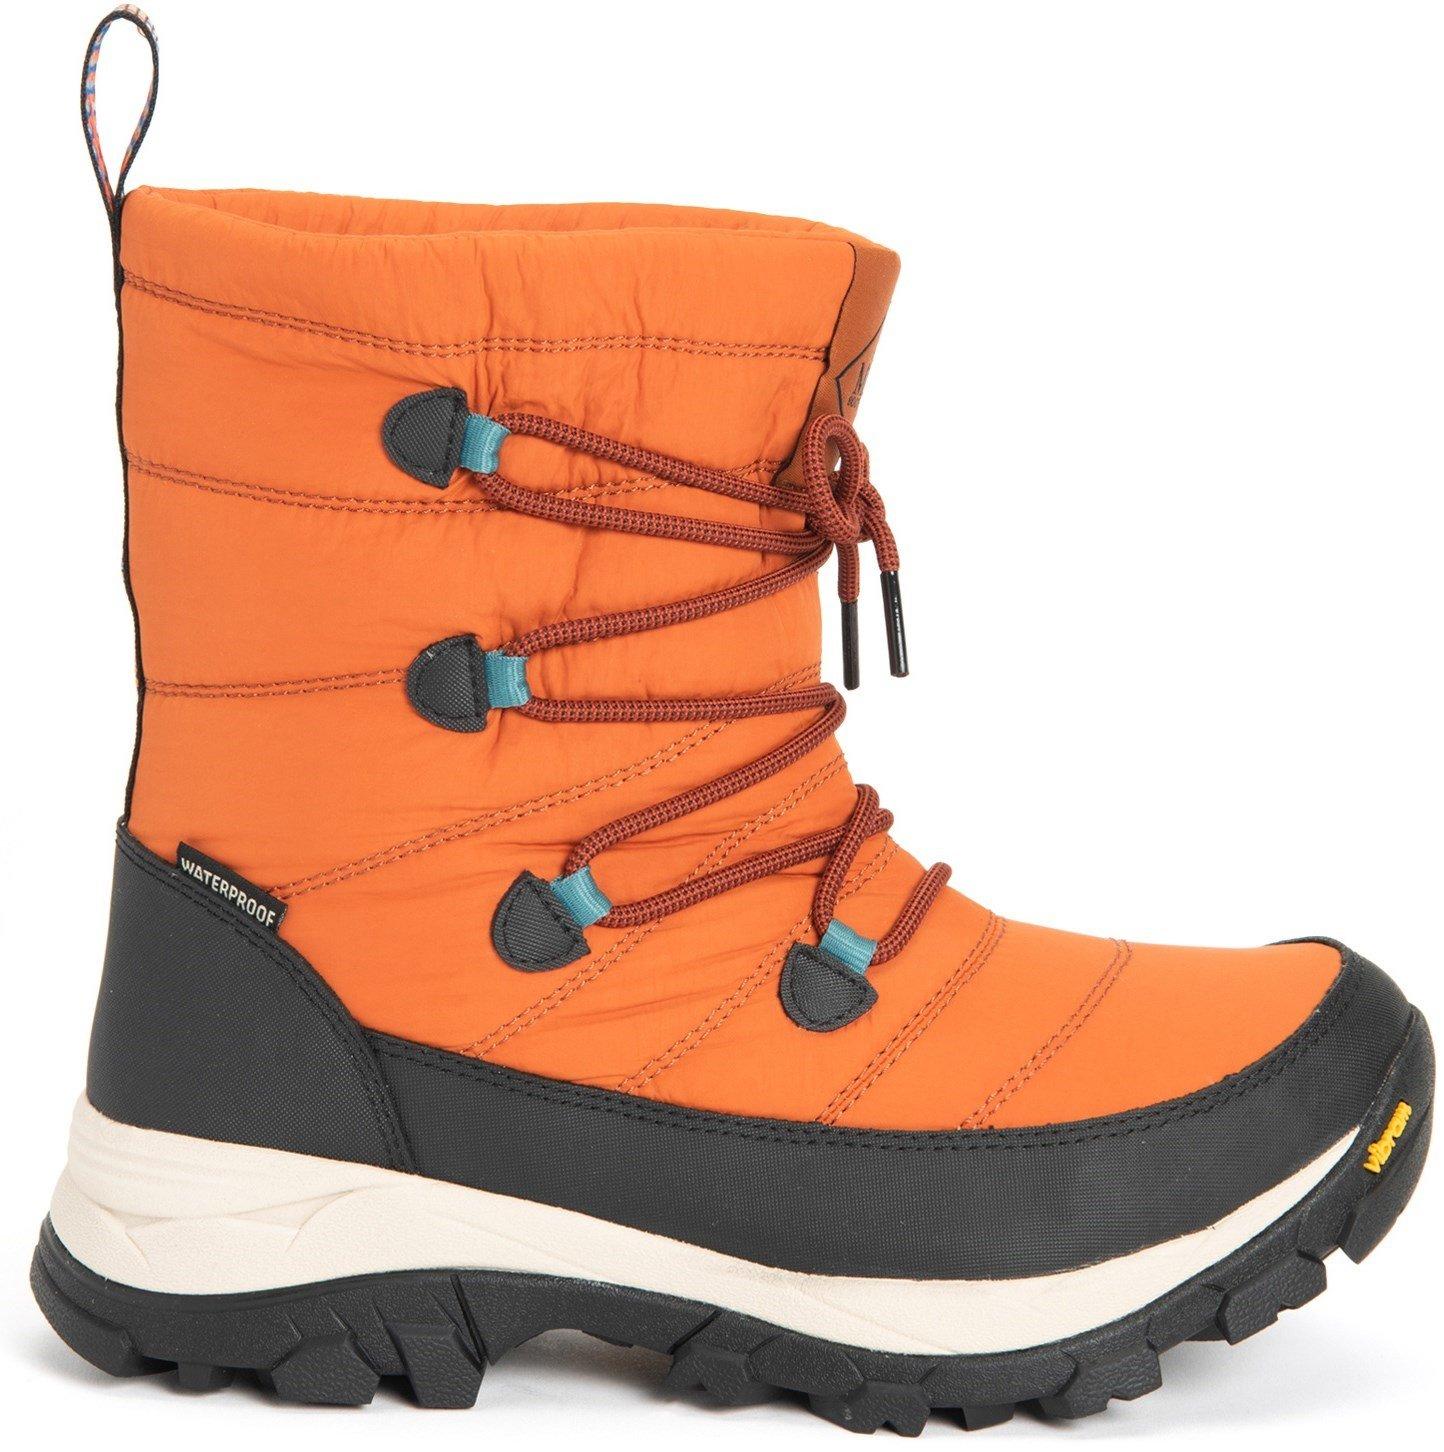 Muck Boots Unisex Arctic Ice Nomadic Vibram Boots Various Colours 30985 - Autumnal 3